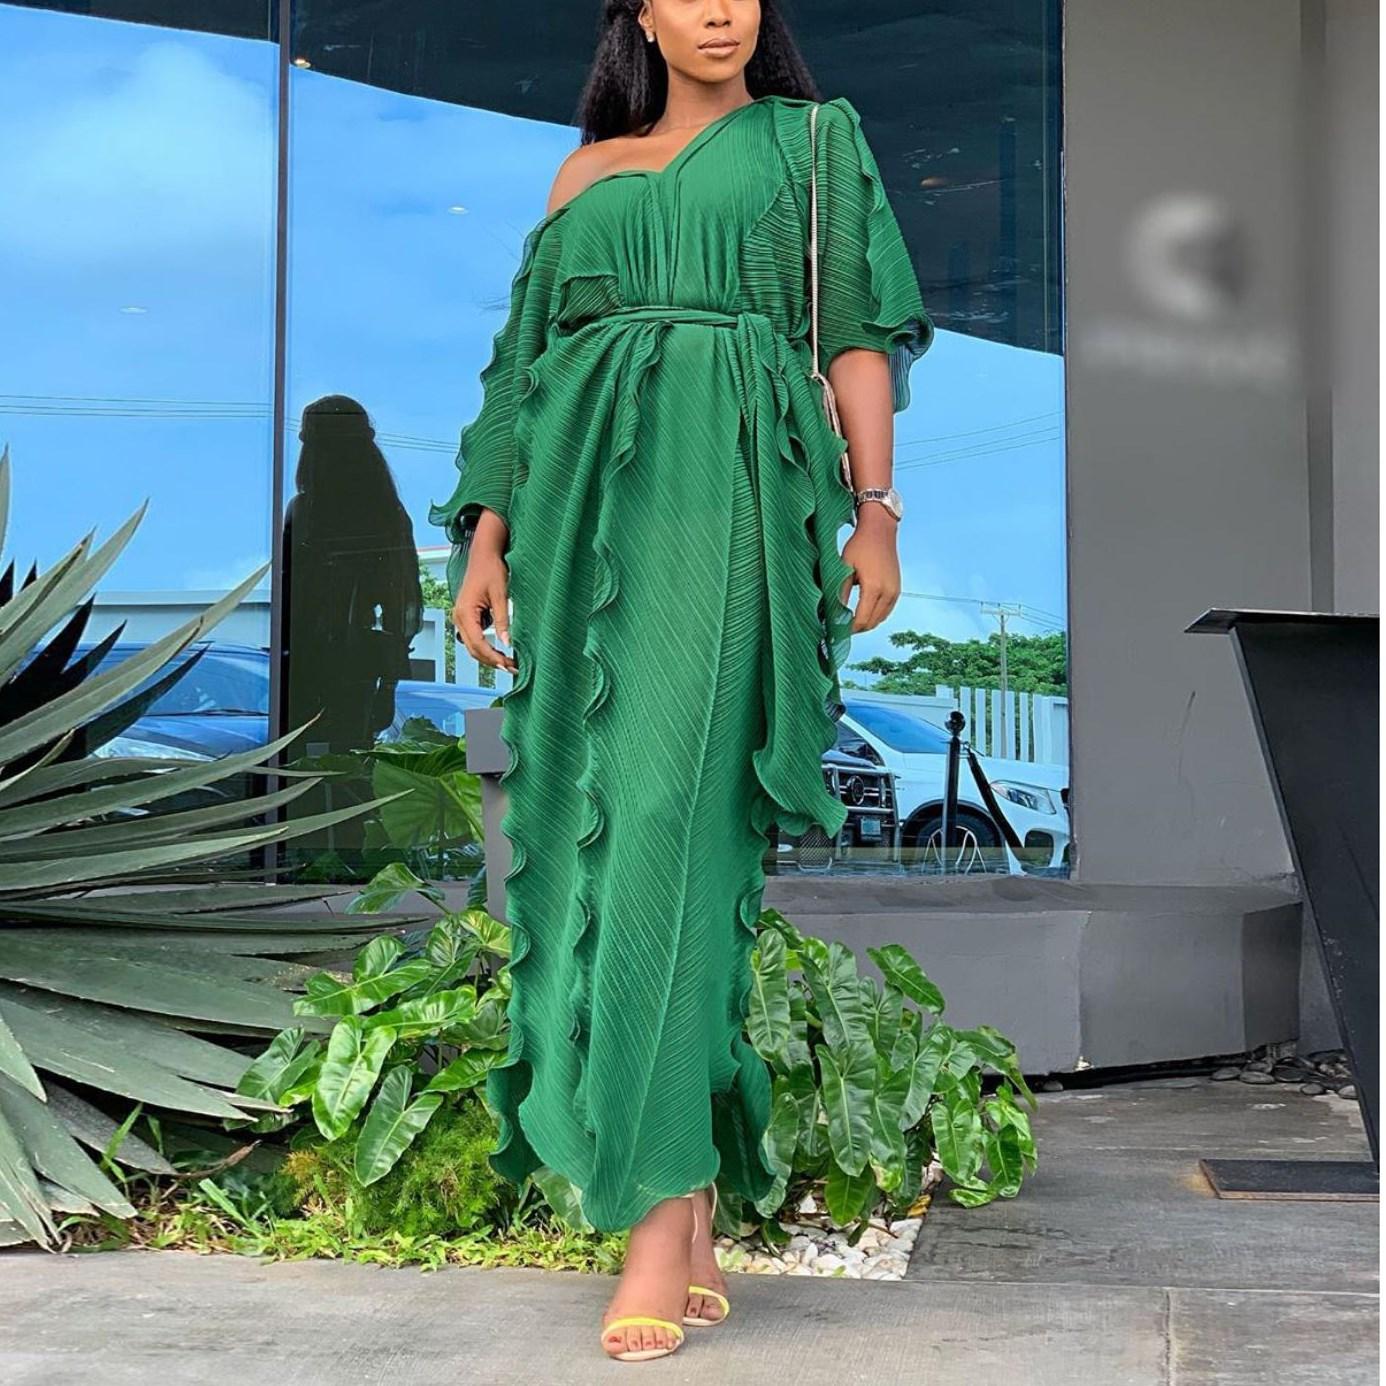 Loose Women Half Sleeve Ruffles Long Dress Casual Boho Style Party Beach Maxi Dress Fashion V Neck Oversized Falbala Dress 1